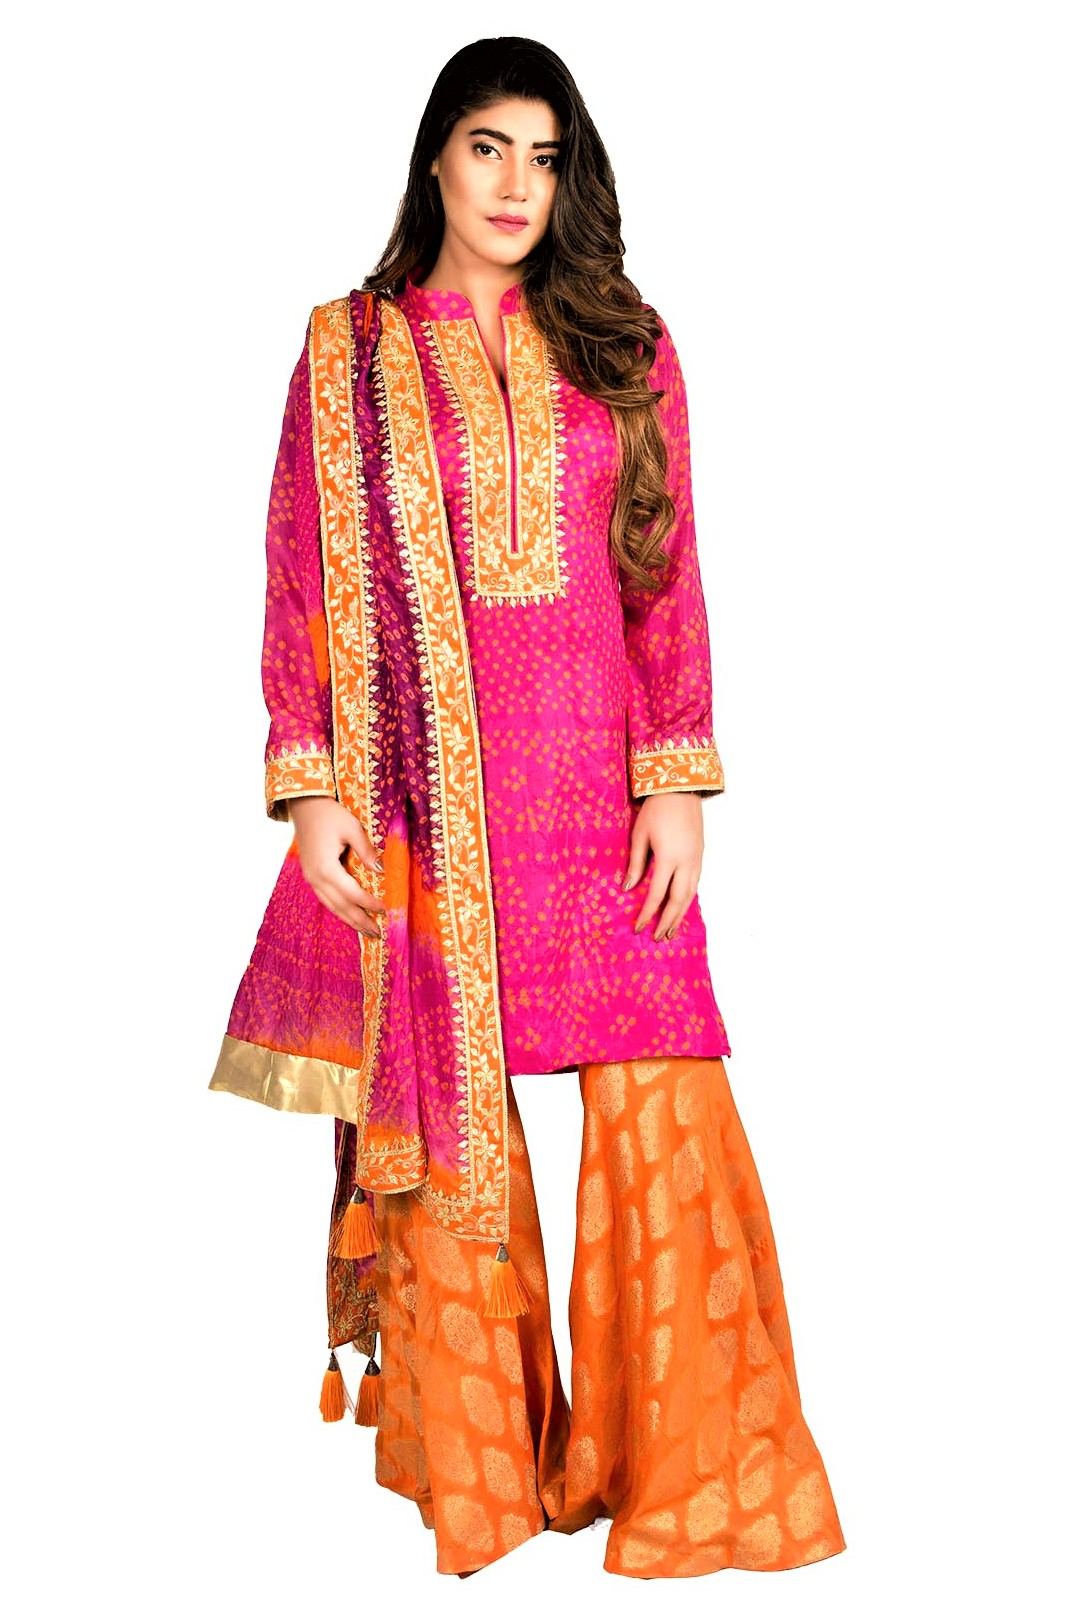 Mehndi Dresses Gota Patti Work on Kurtis